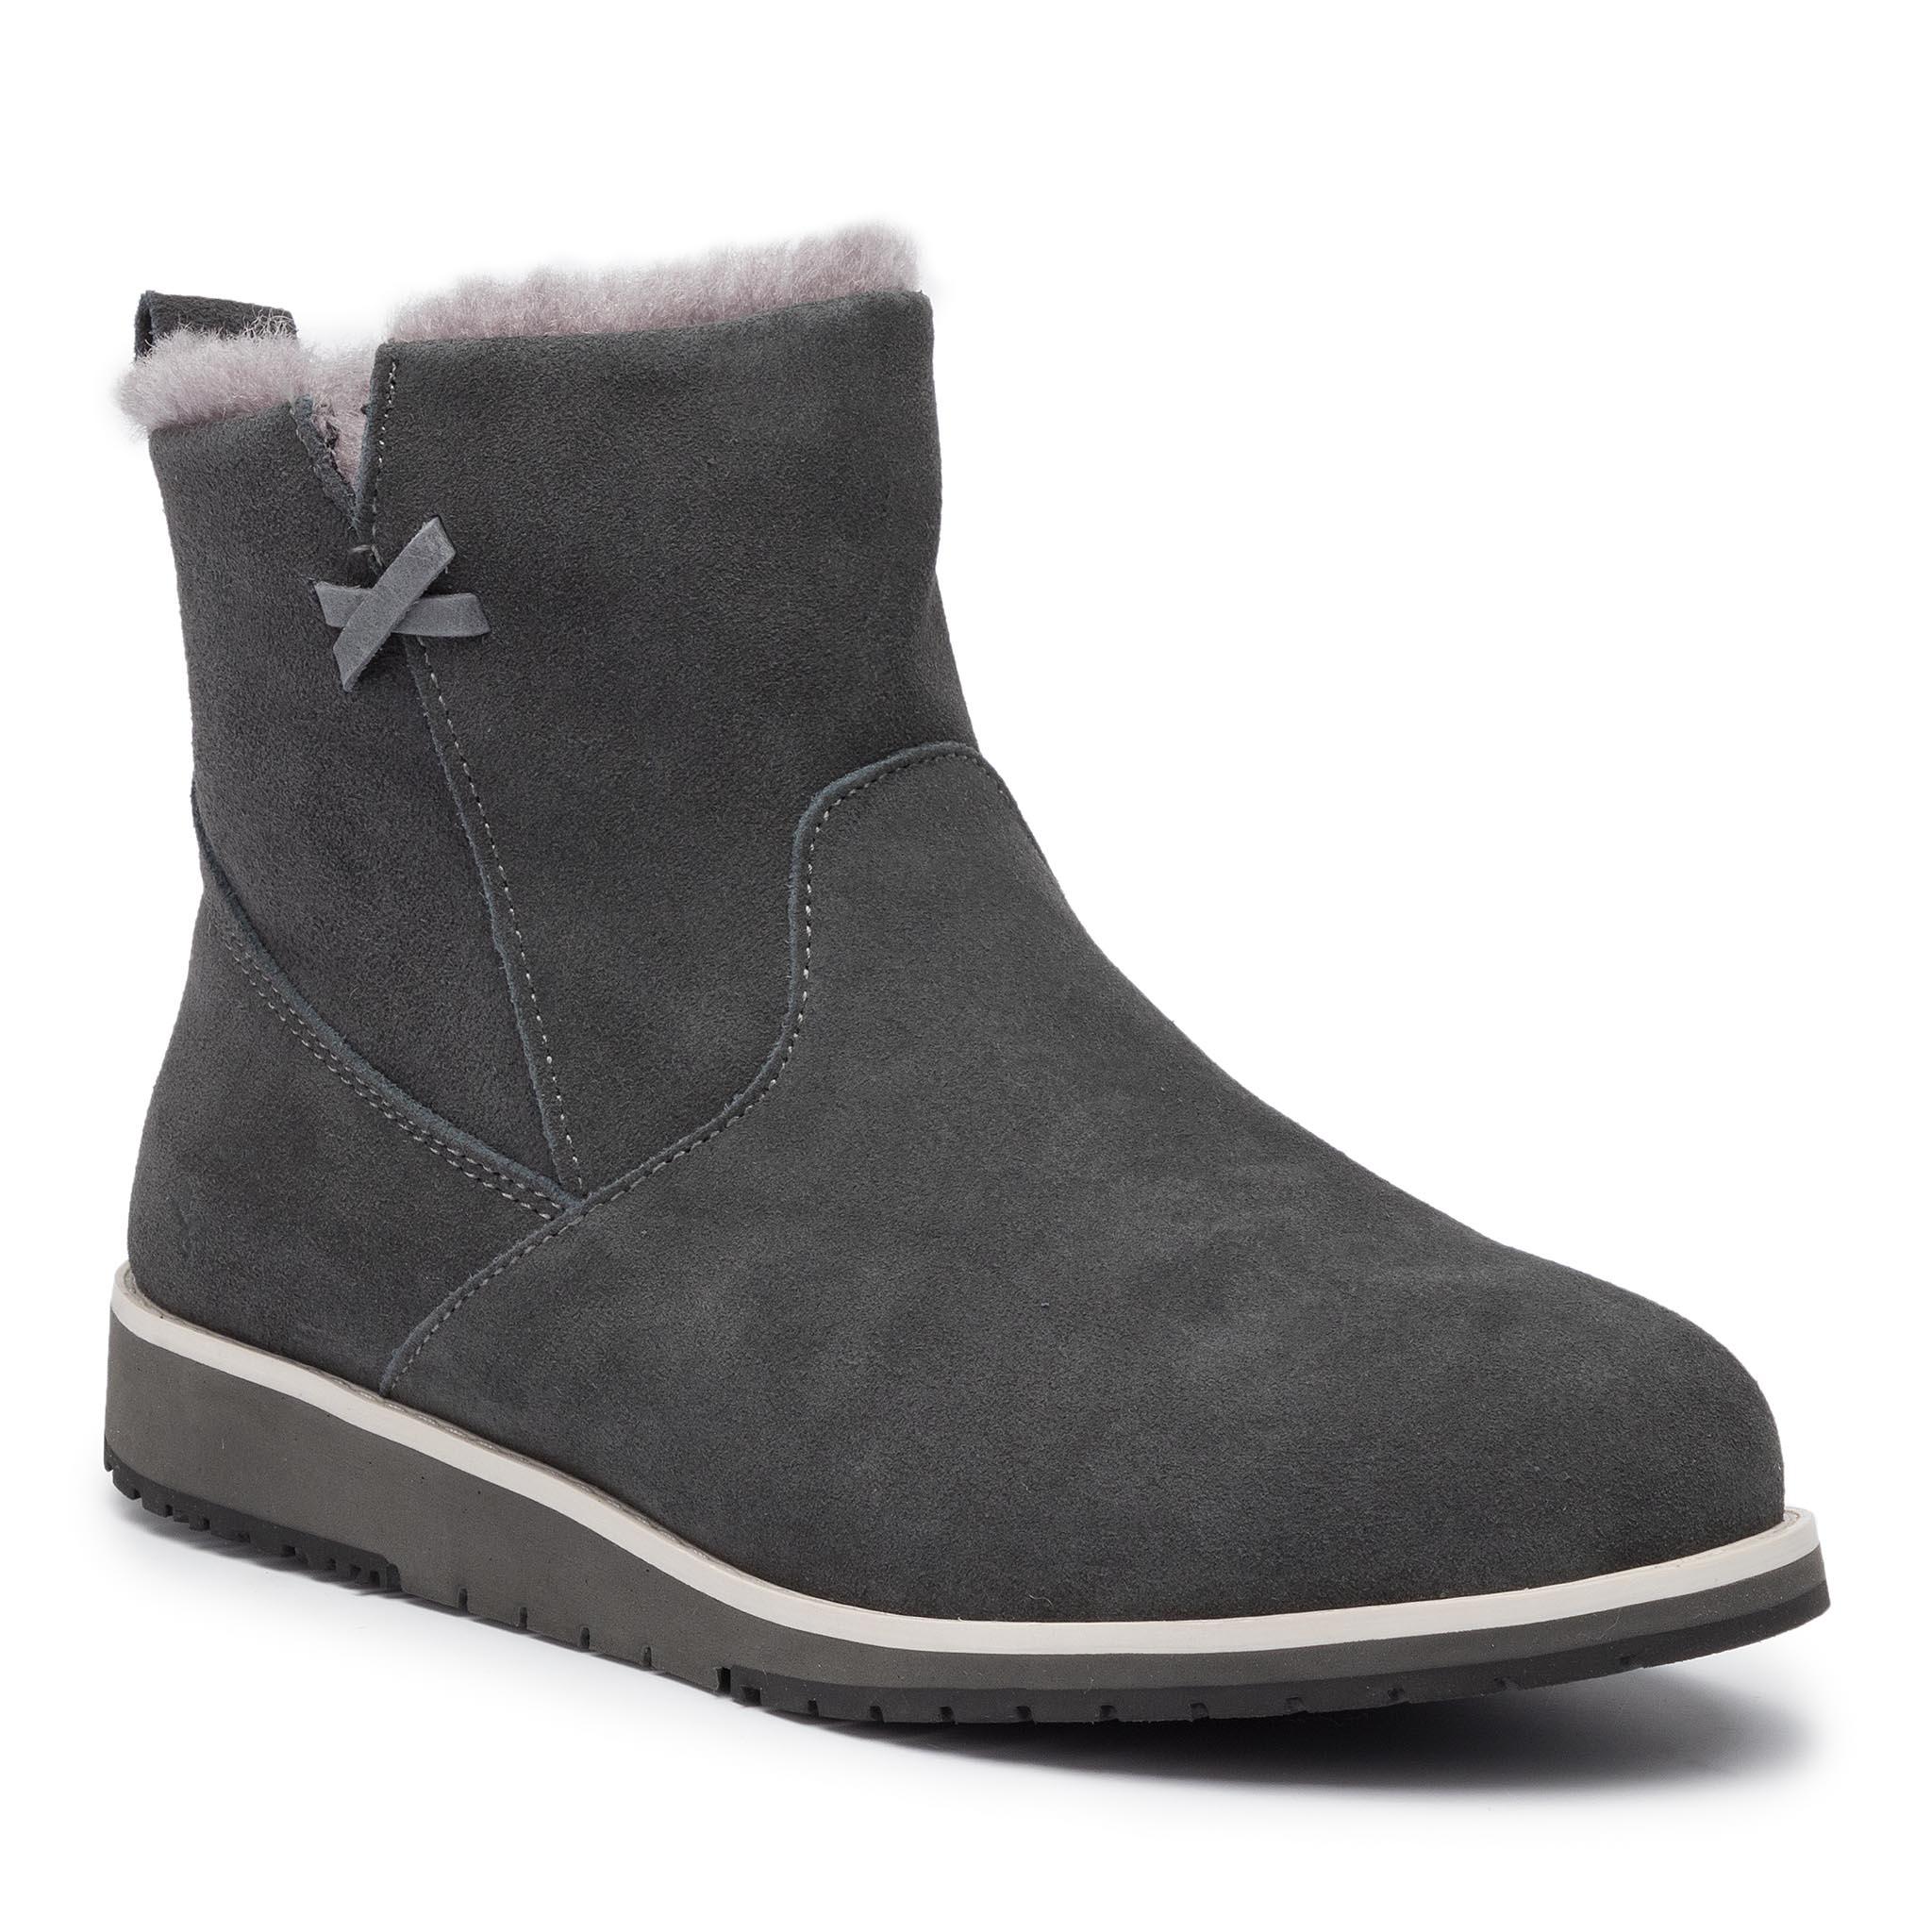 Image of Schuhe EMU AUSTRALIA - Beach Mini W11026 Dark Grey